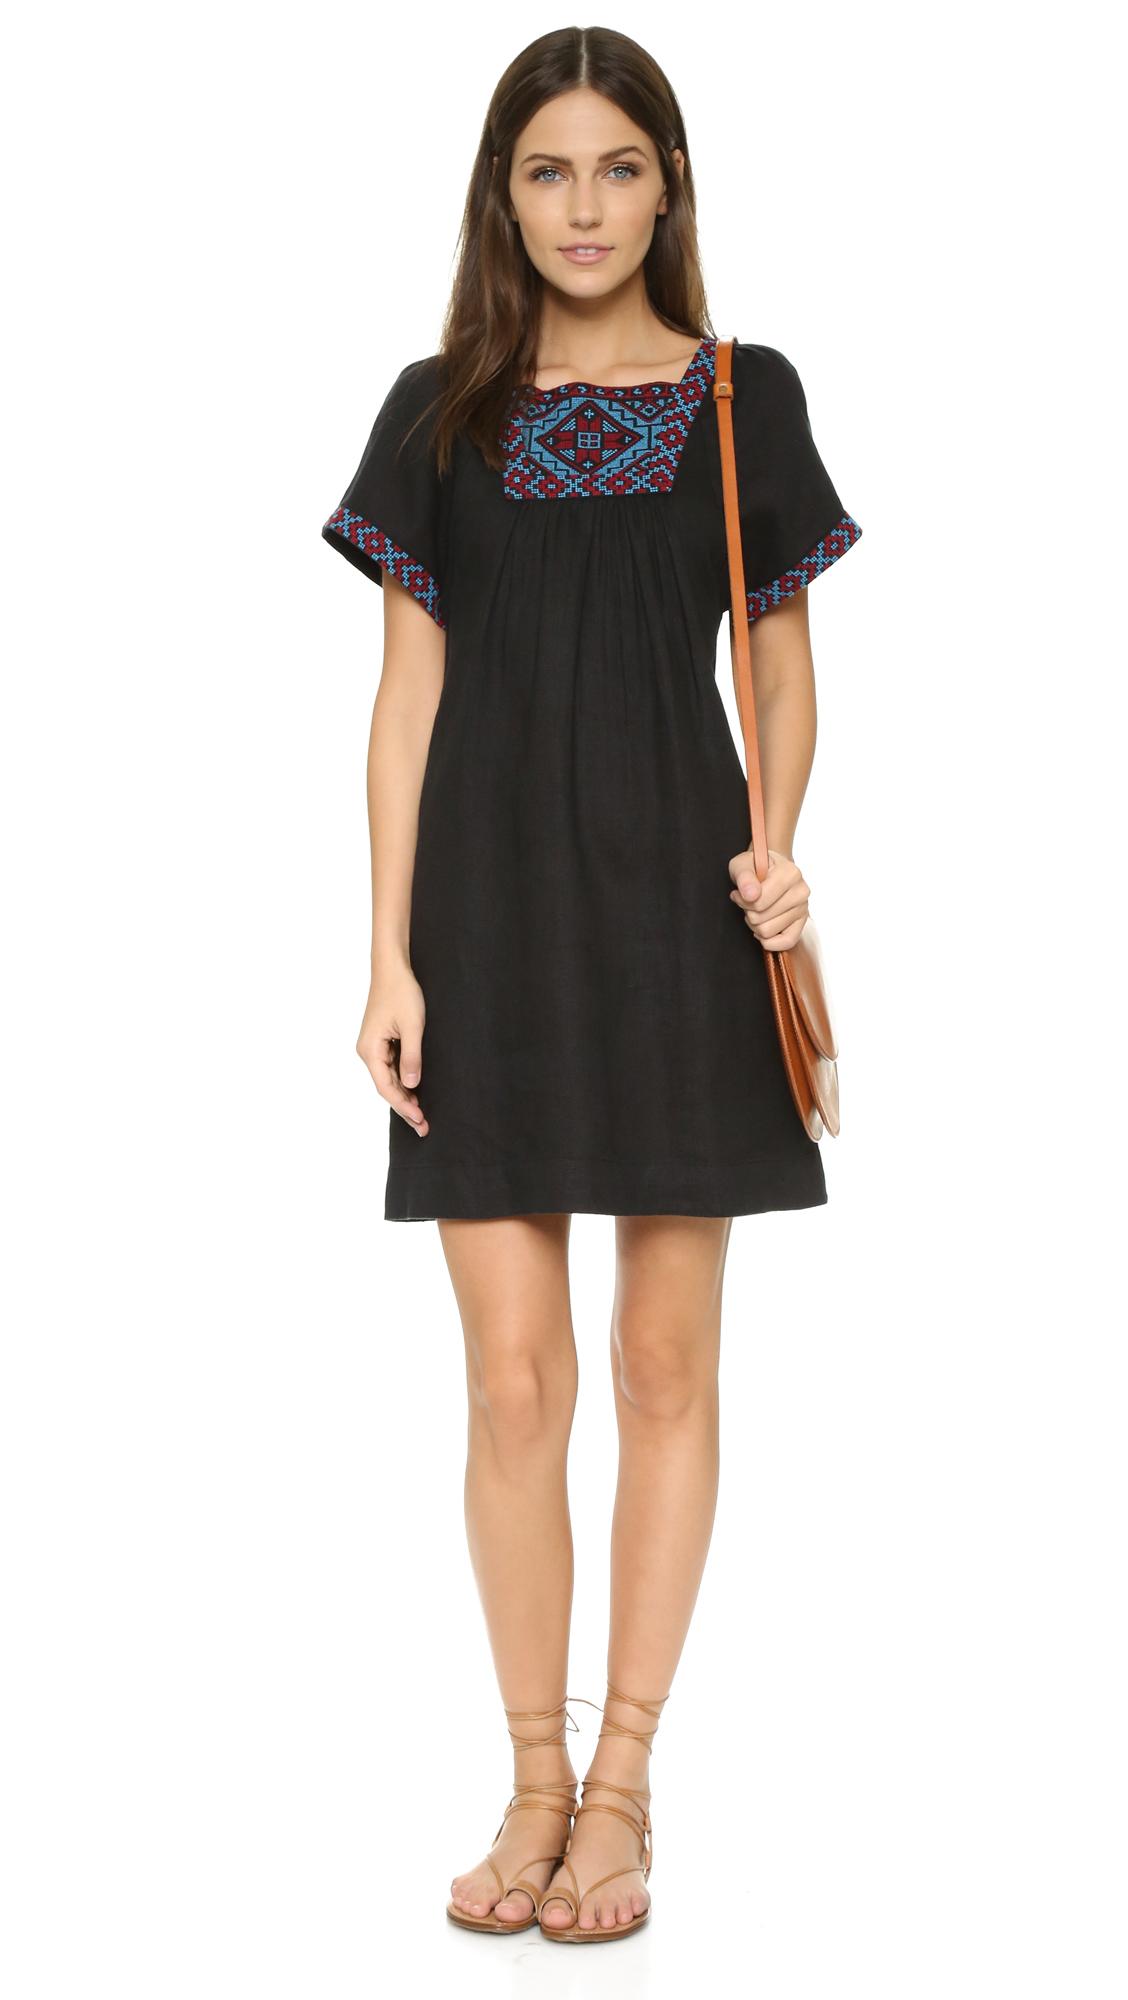 b2053d4b45 Madewell Embroidered Wander Dress